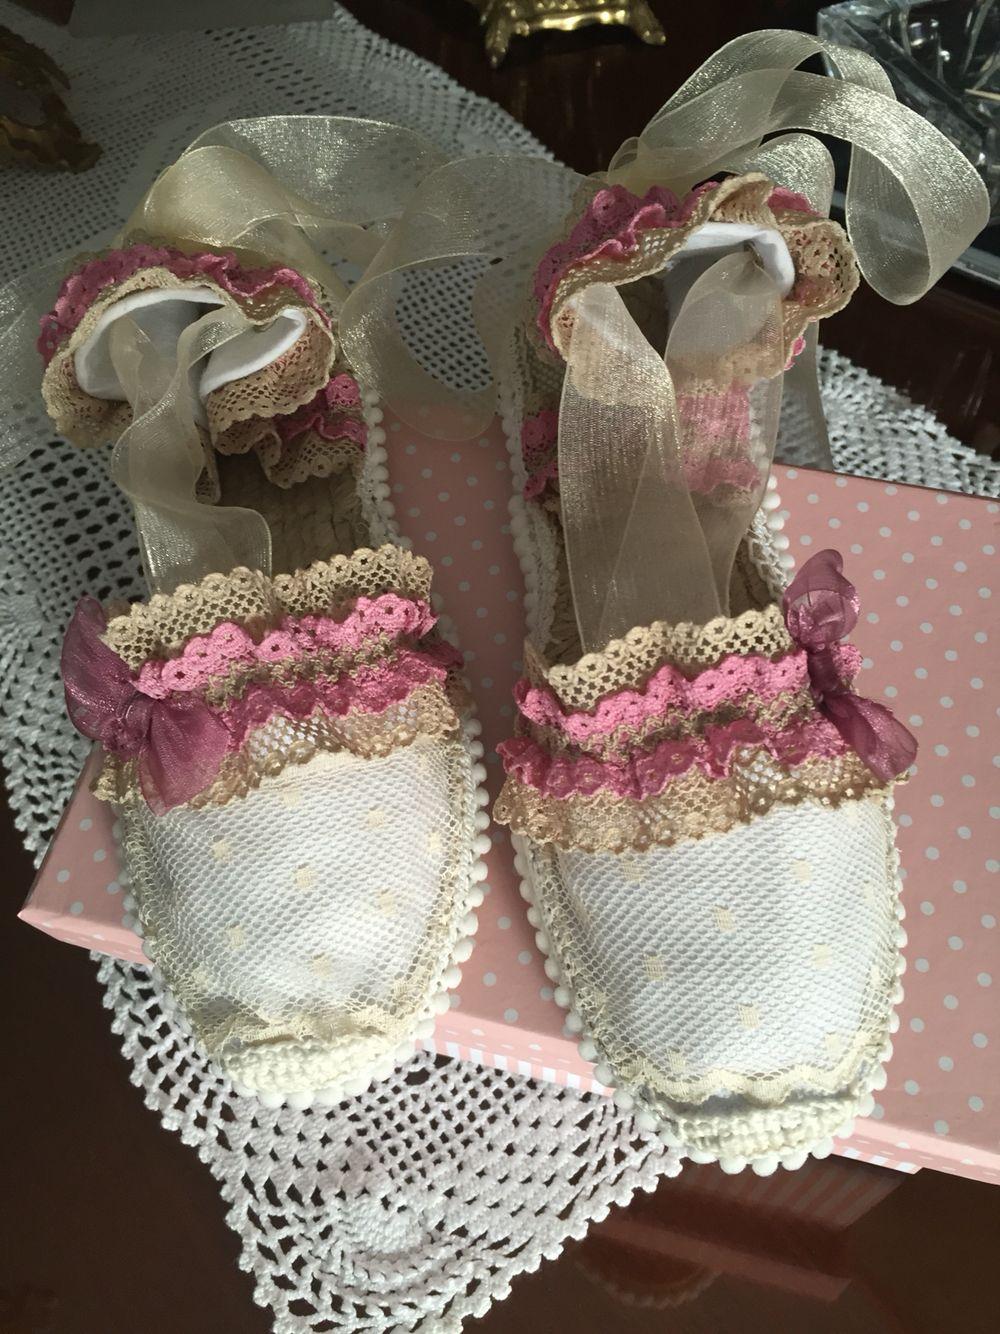 nueva llegada 76090 ecd74 Apargatas de niña para 1 Comunion | calzado | Zapatillas ...